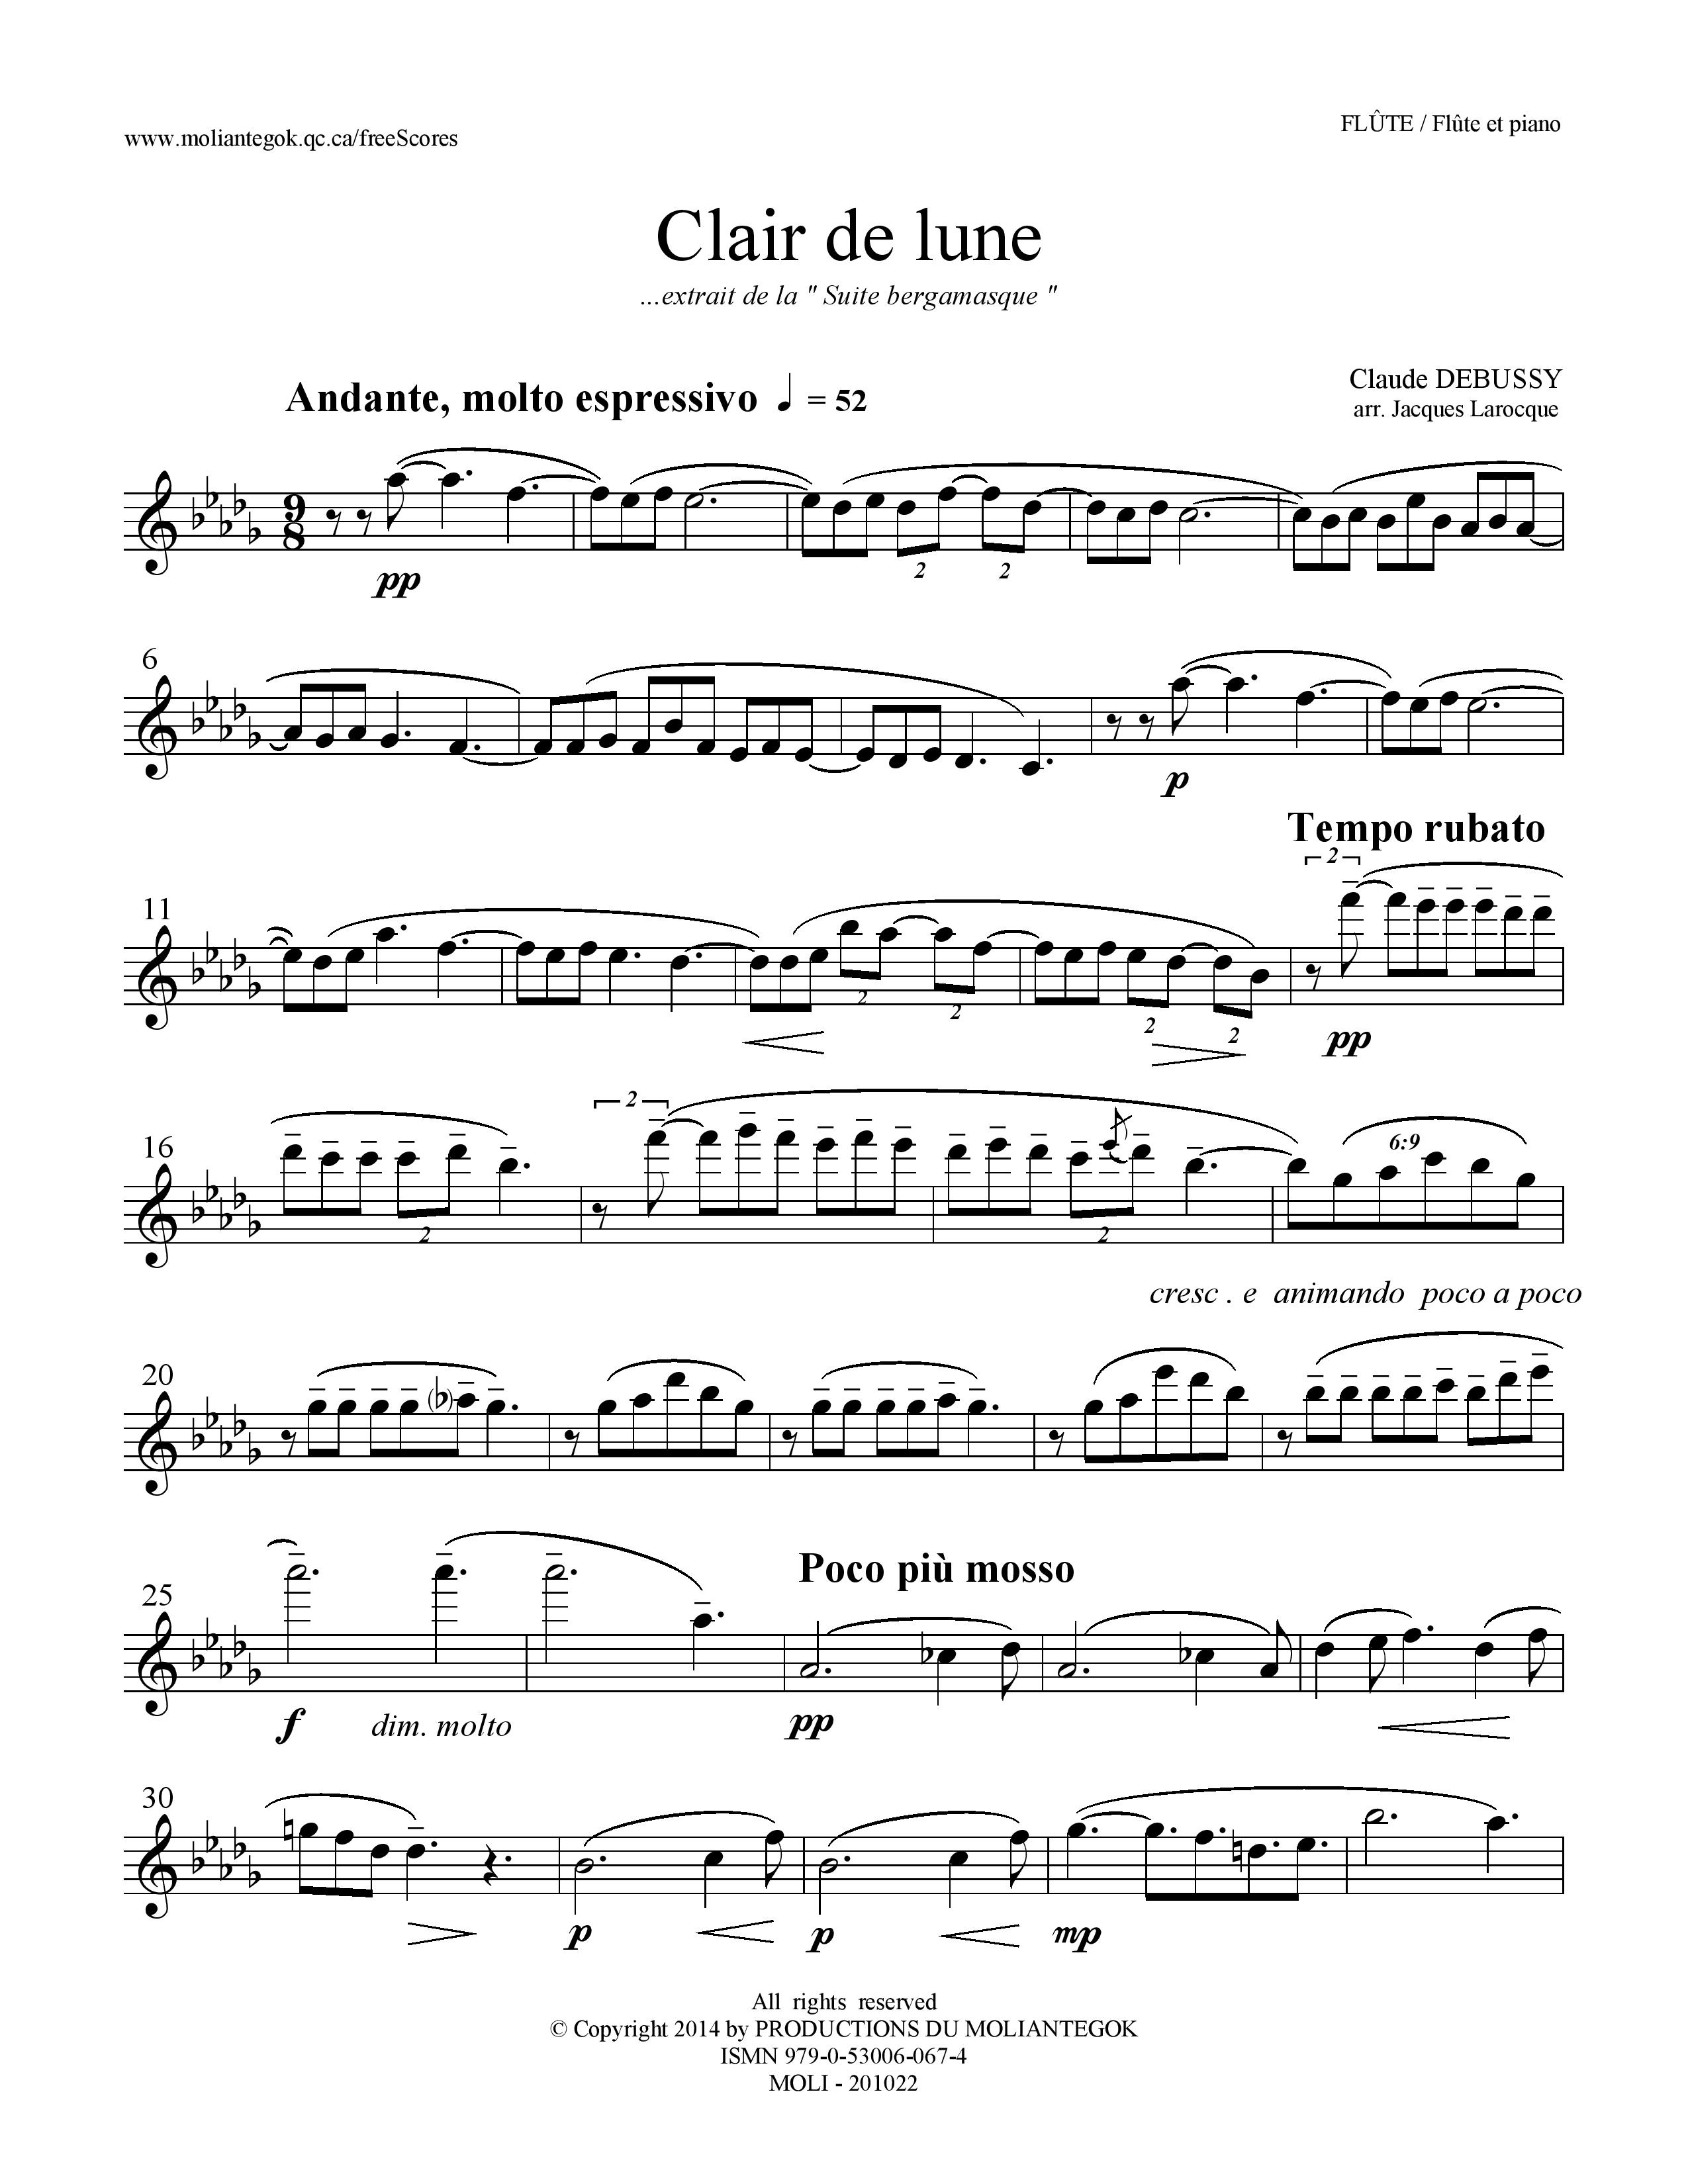 La Vie En Rose Ukulele Chords Clair De Lune Violin Sheet Music Free Sheet Music